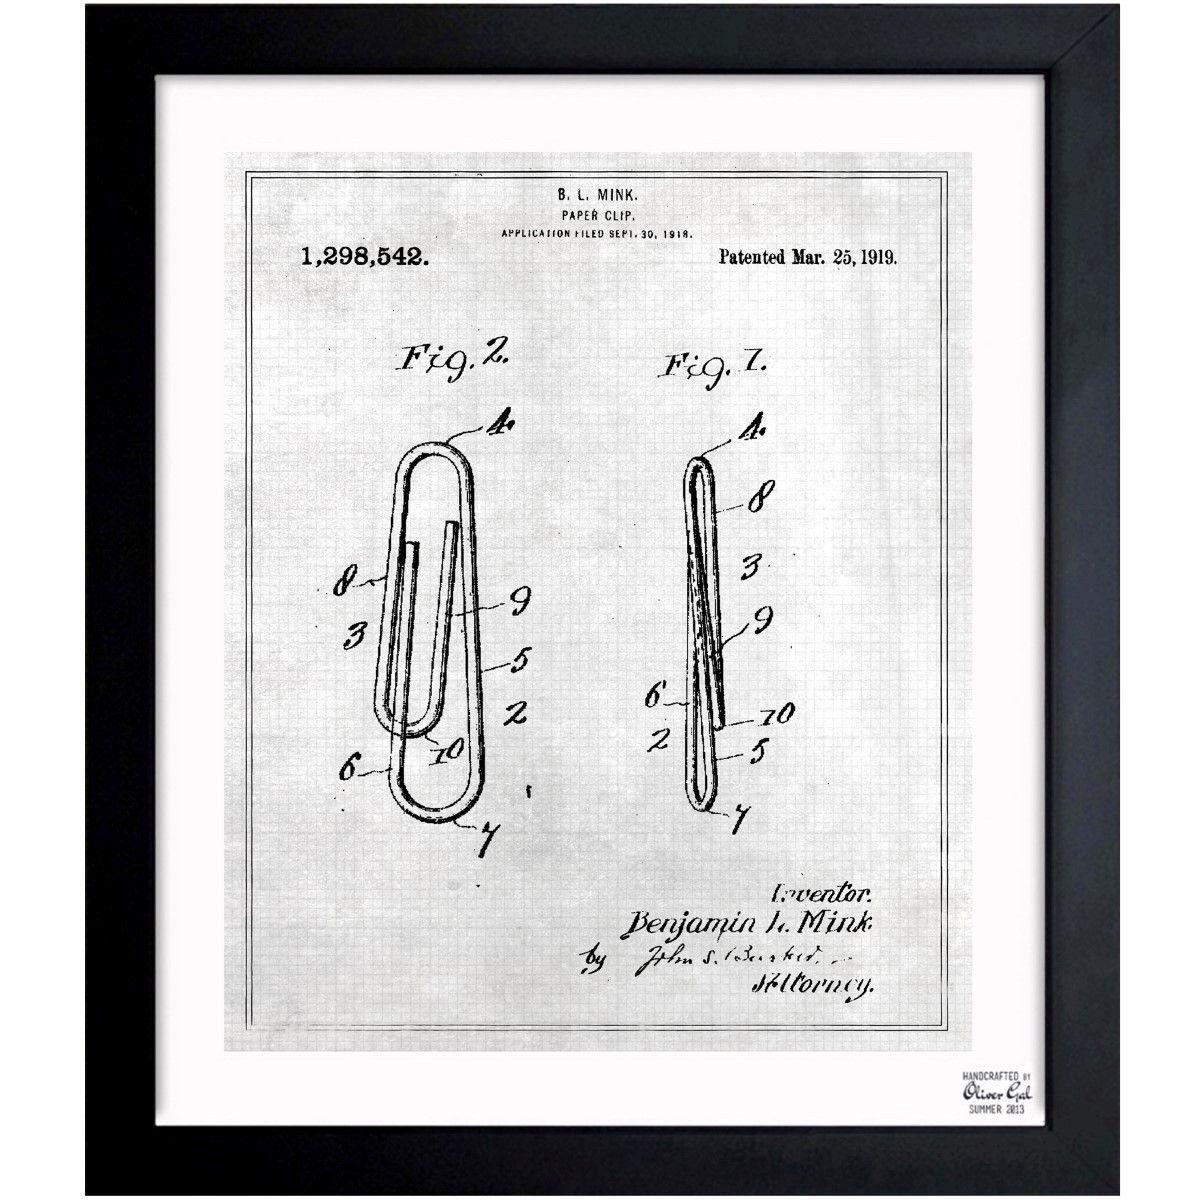 Oliver gal paper clip 1919 framed blueprint art paper clip art oliver gal paper clip 1919 framed blueprint art malvernweather Gallery